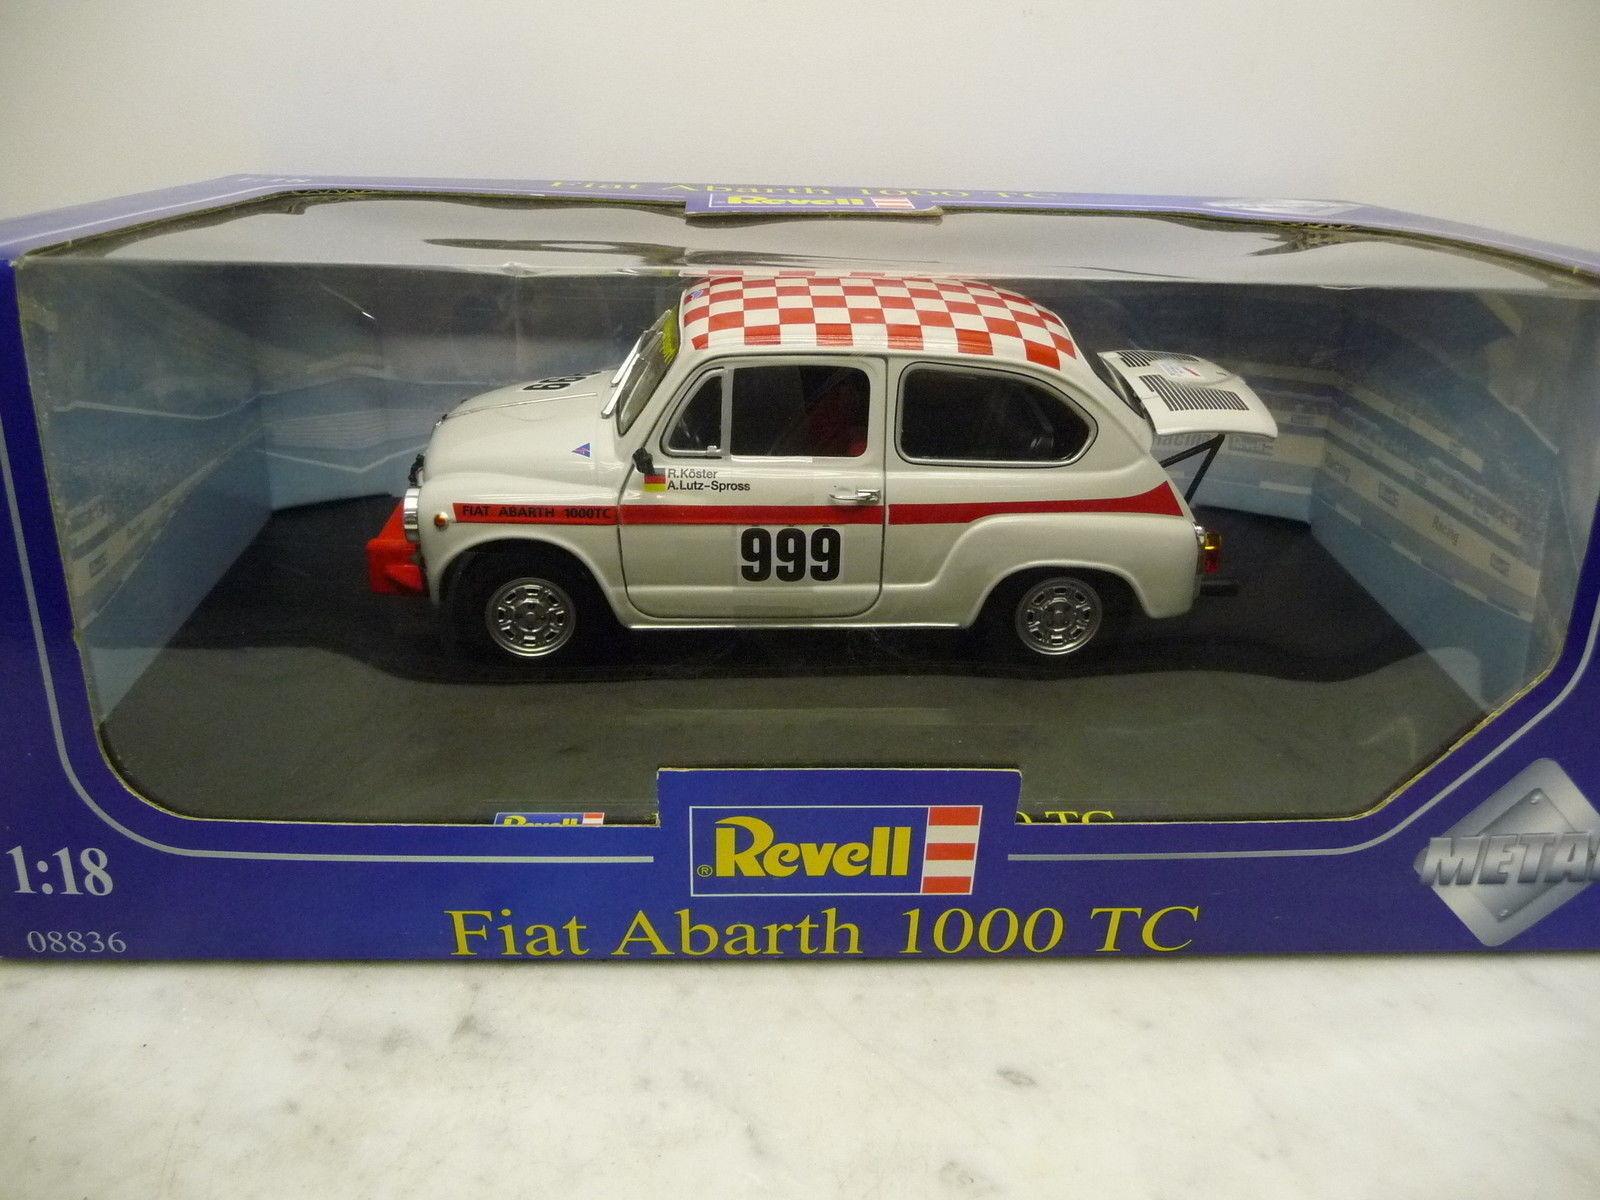 Revell 1 18 08836 Fiat Abarth 1000 TC Team Koster Lutz-trocito mercancía nueva Top